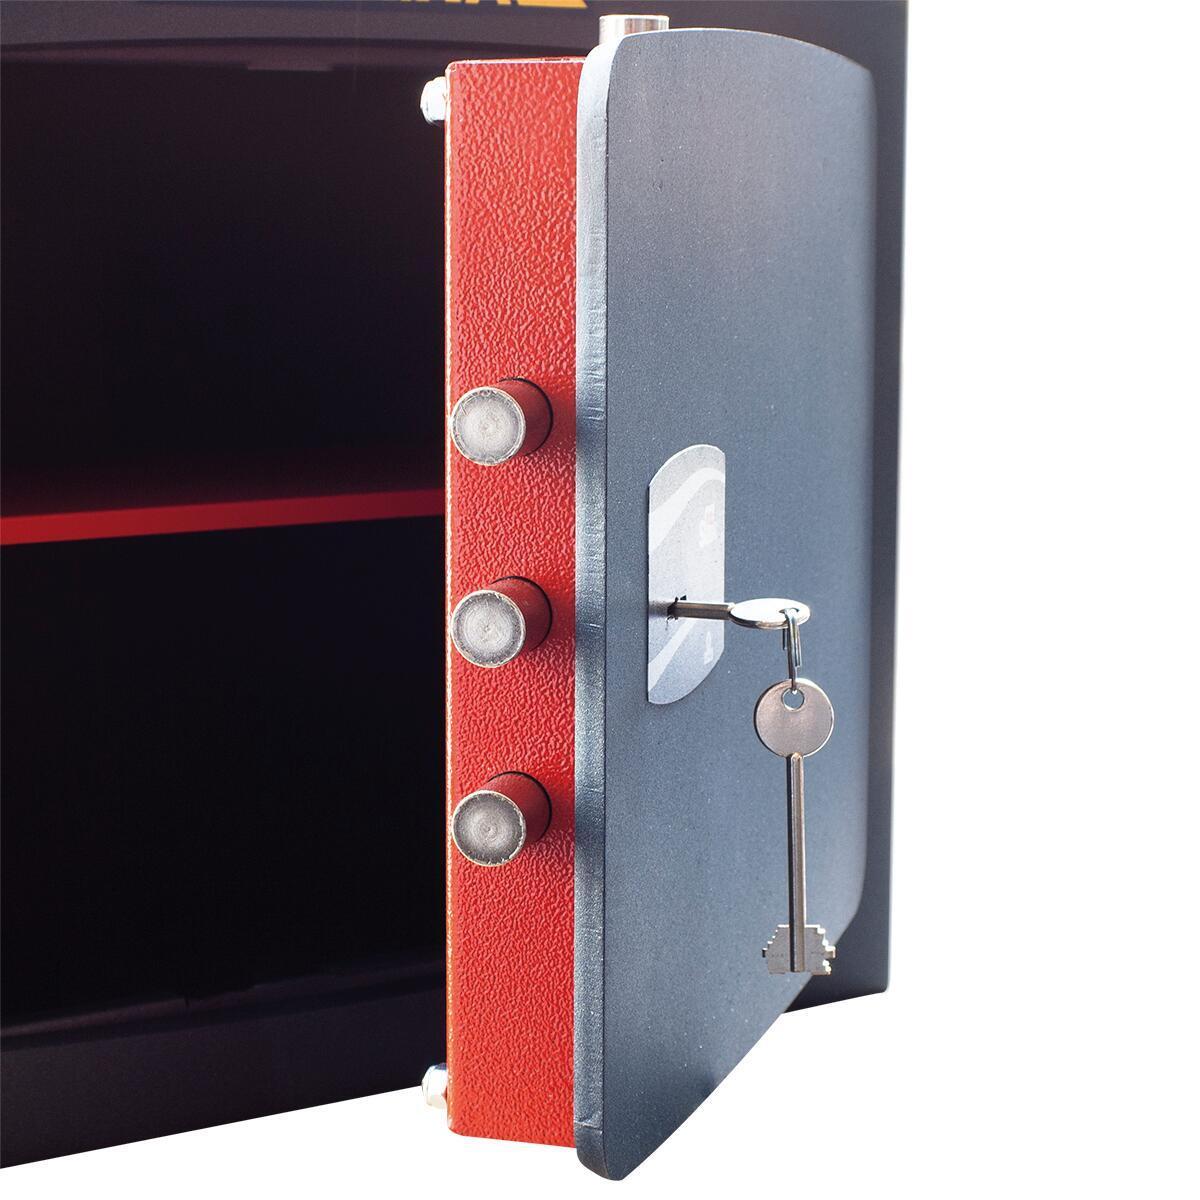 Cassaforte a chiave STARK 1205P da murare L32 x P24 x H49 cm - 6